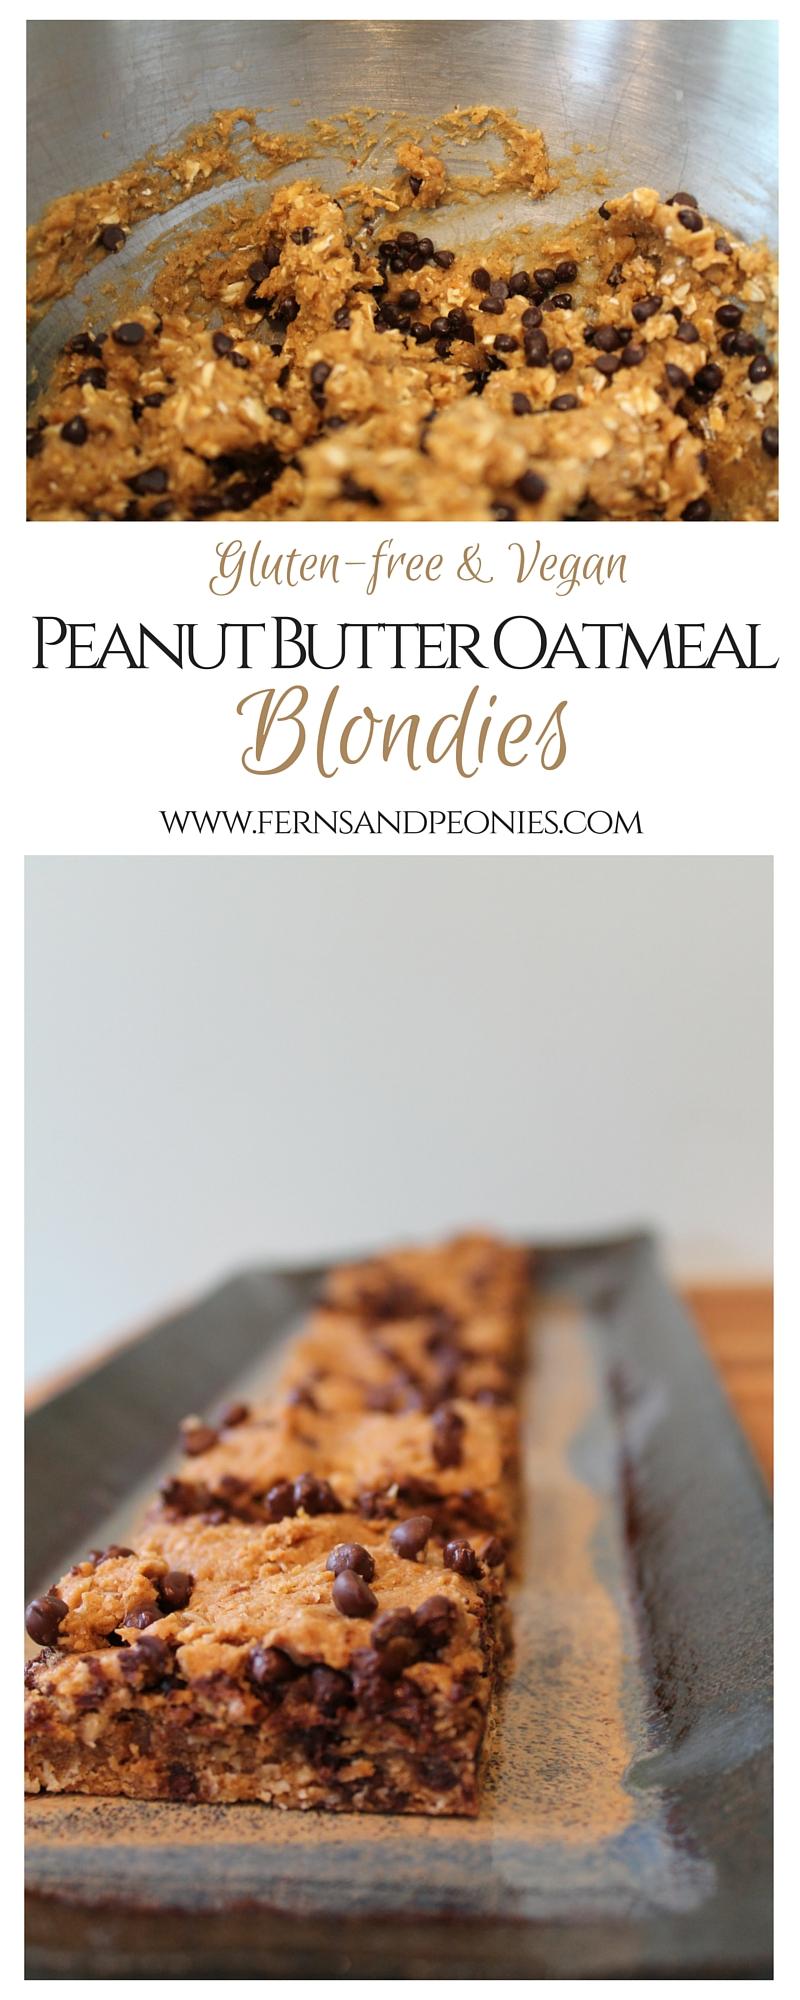 Peanut Butter Oatmeal Blondies (GF,V) from www.fernsandpeonies.com